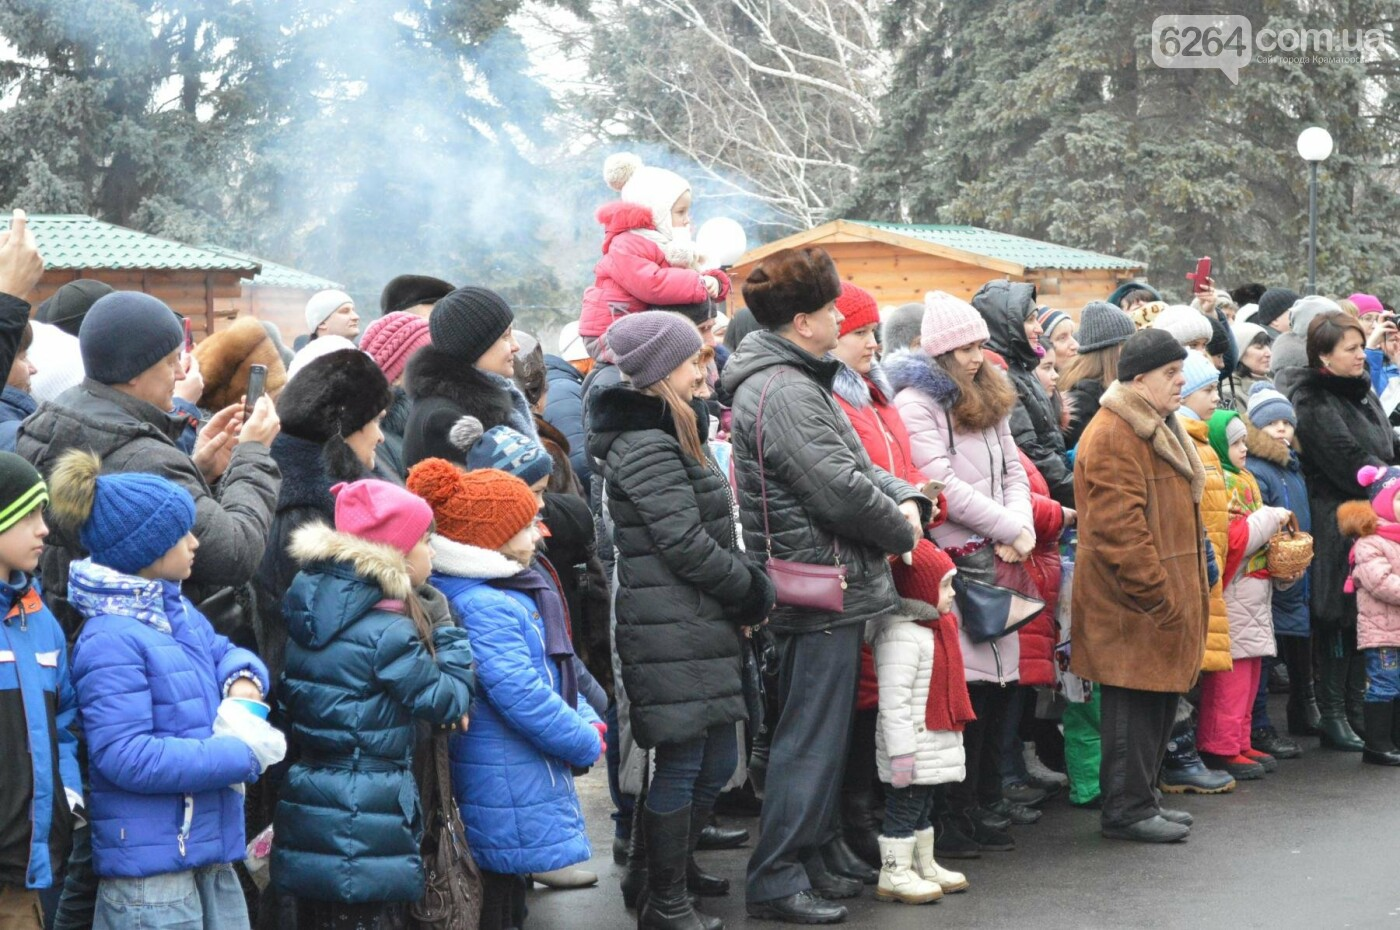 Краматорск празднует Масленицу, фото-5